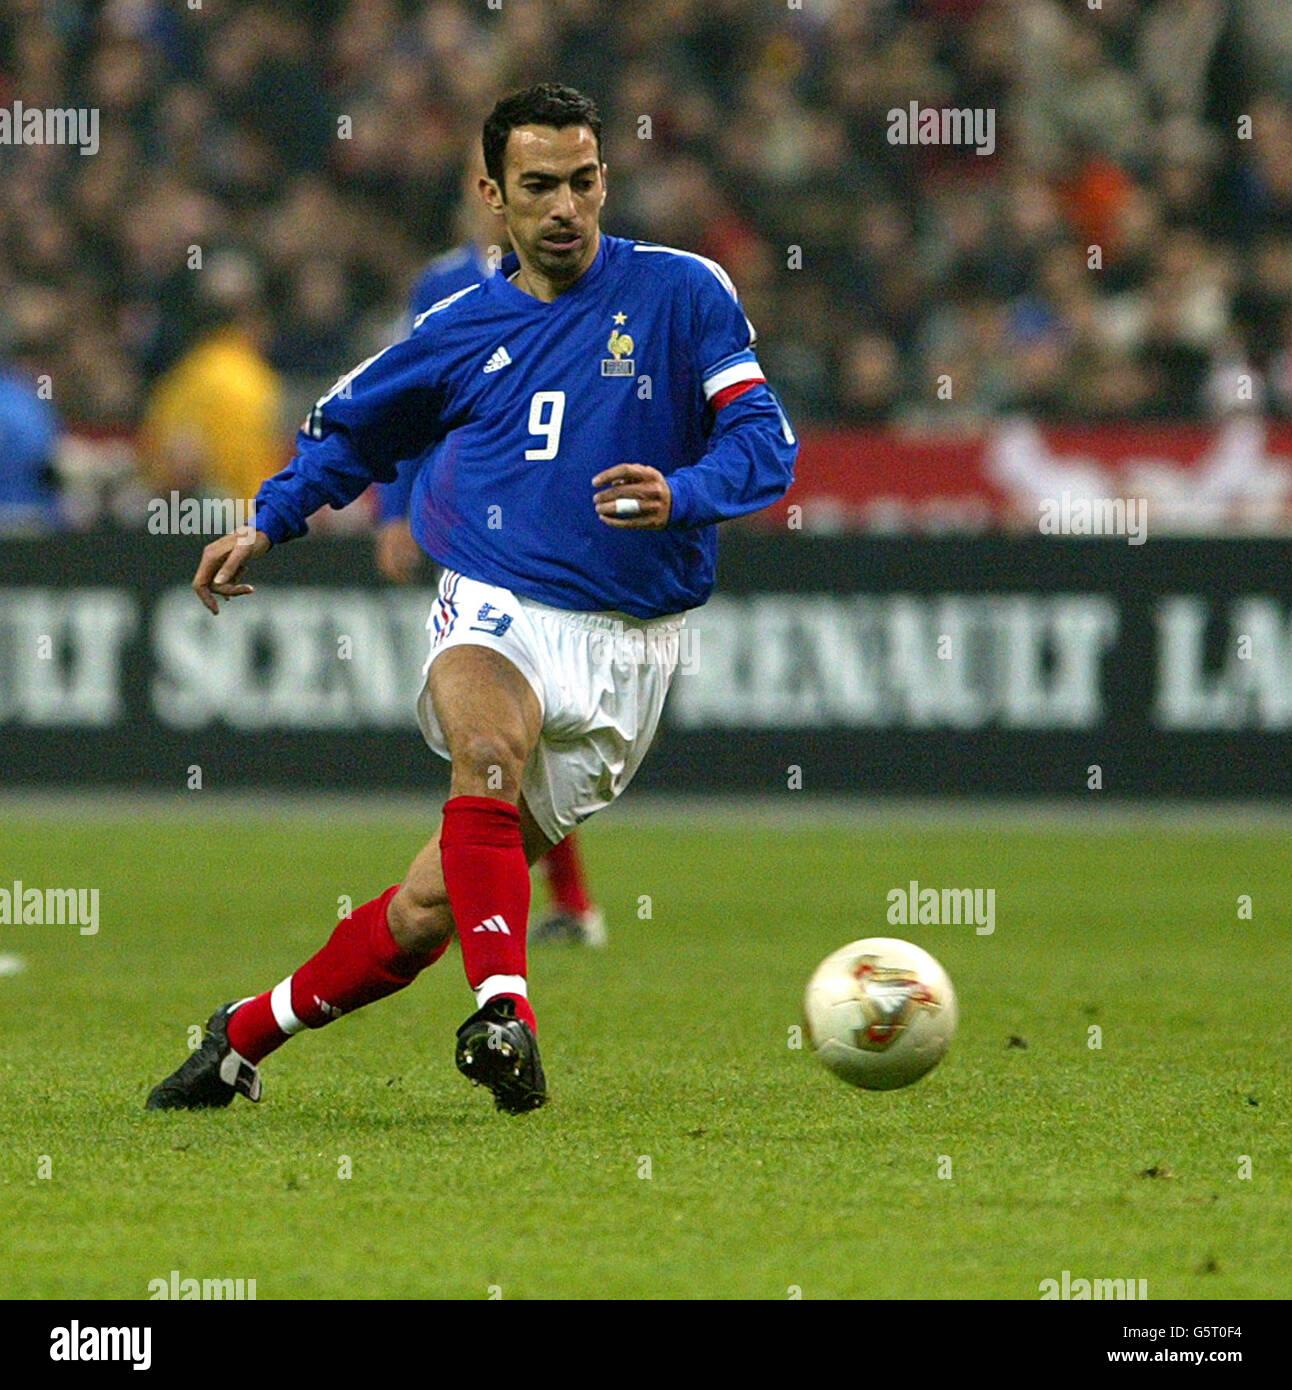 Yuri Djorkaeff: biography of the French football player 59